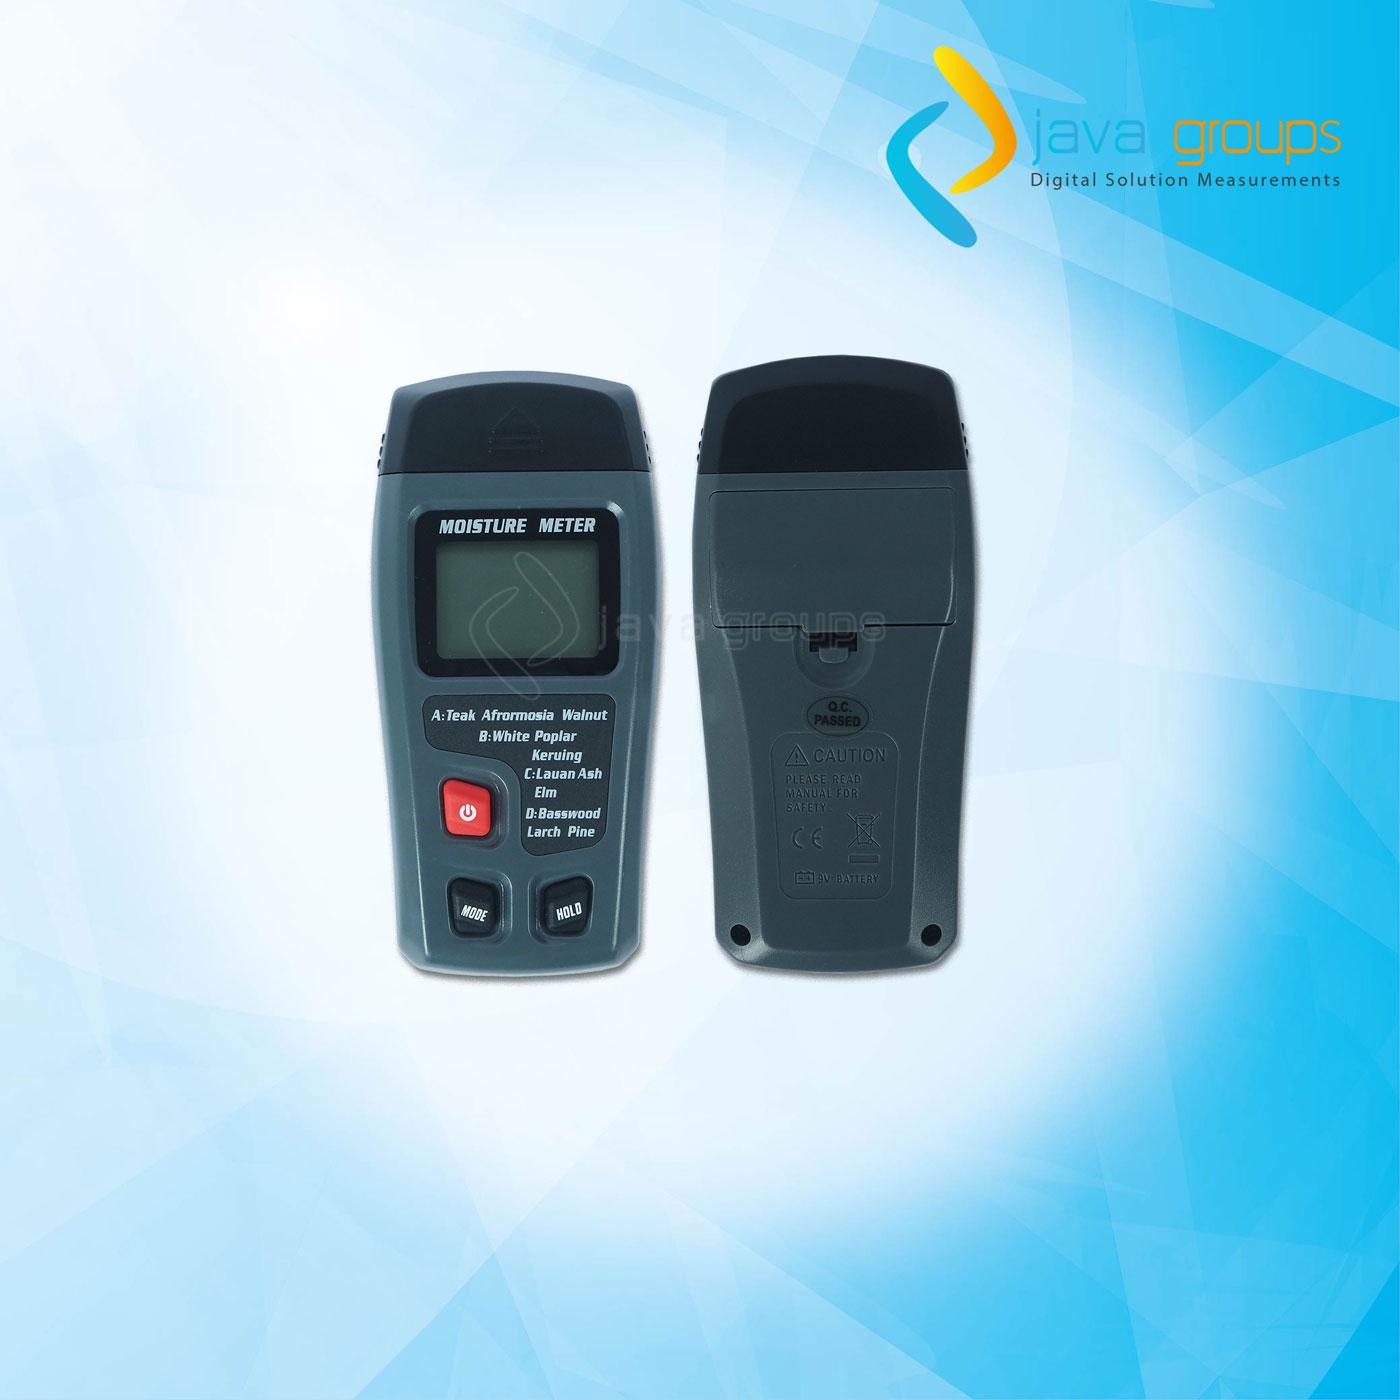 Alat Uji Digital Kadar Air Atau Kelembaban Kayu MD010